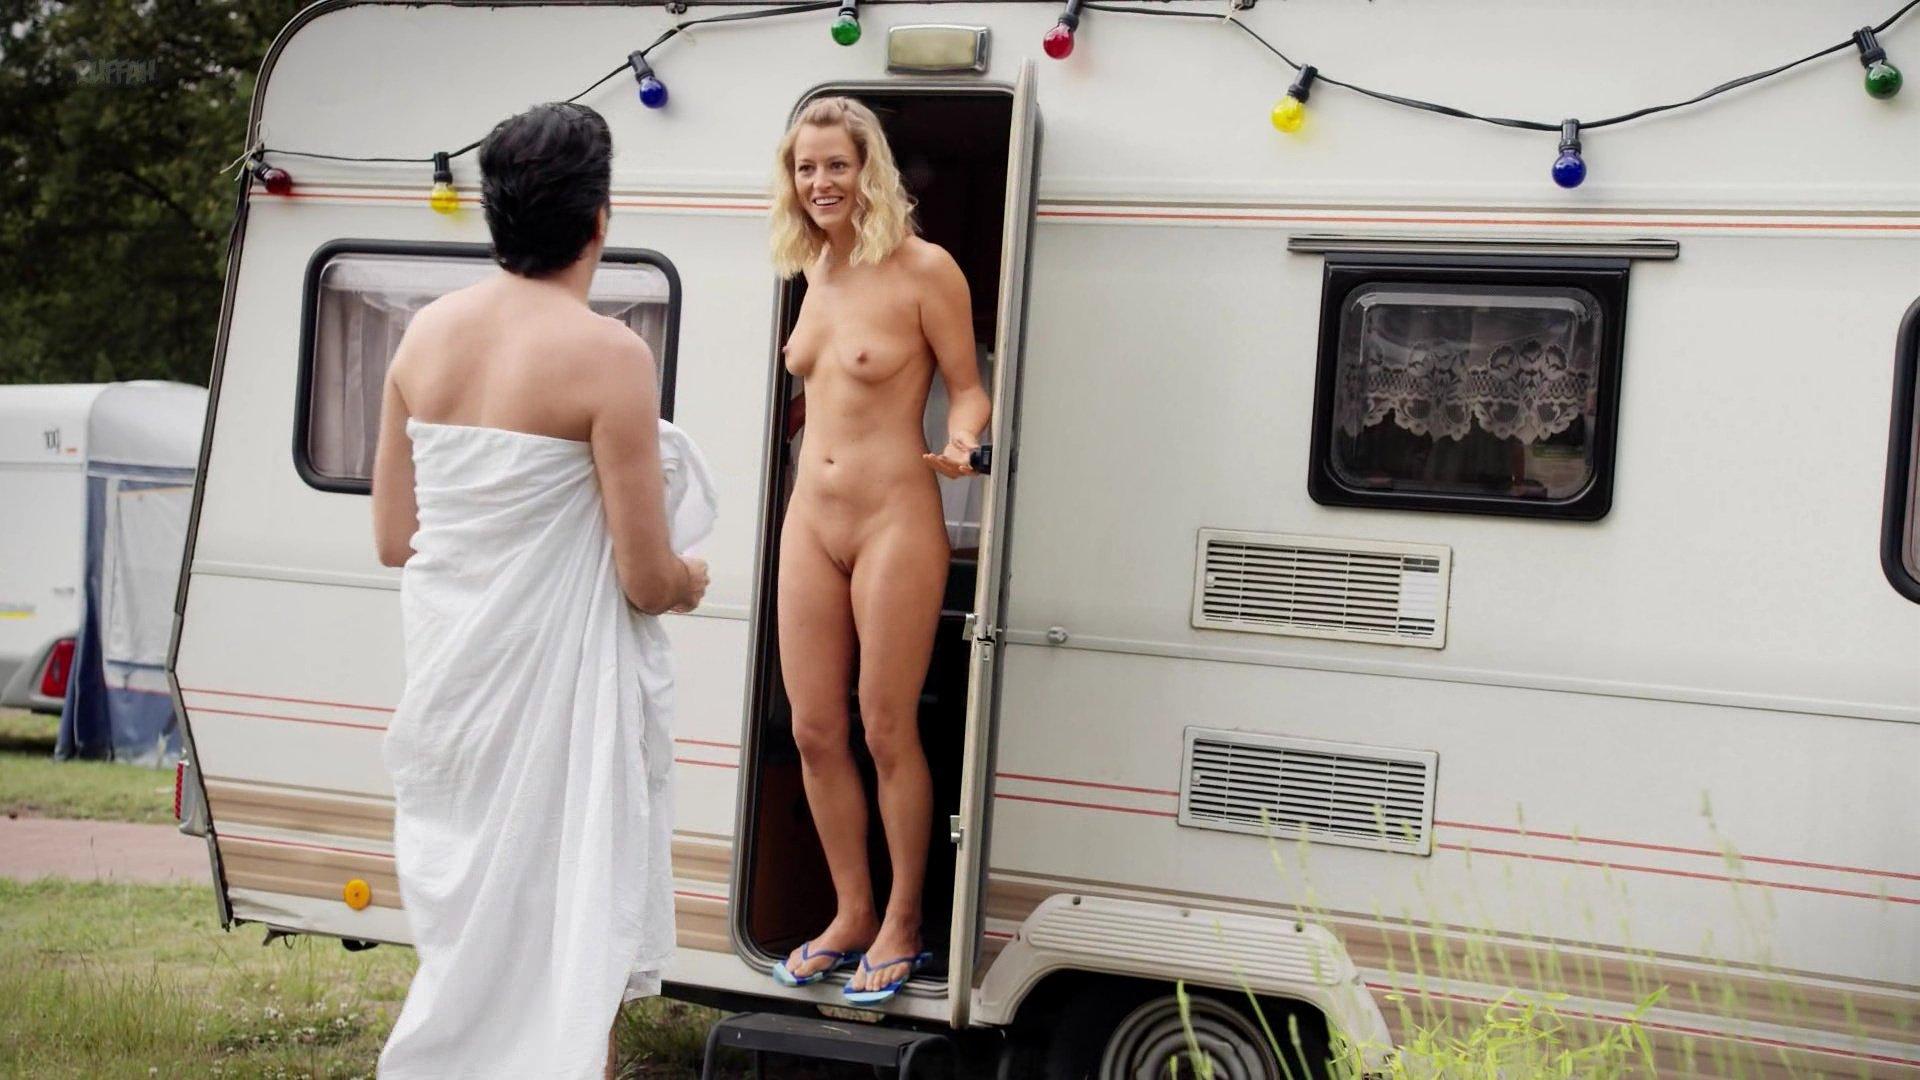 Birge Schade nude, Antje Koch nude - Pastewka s08e02 (2018)